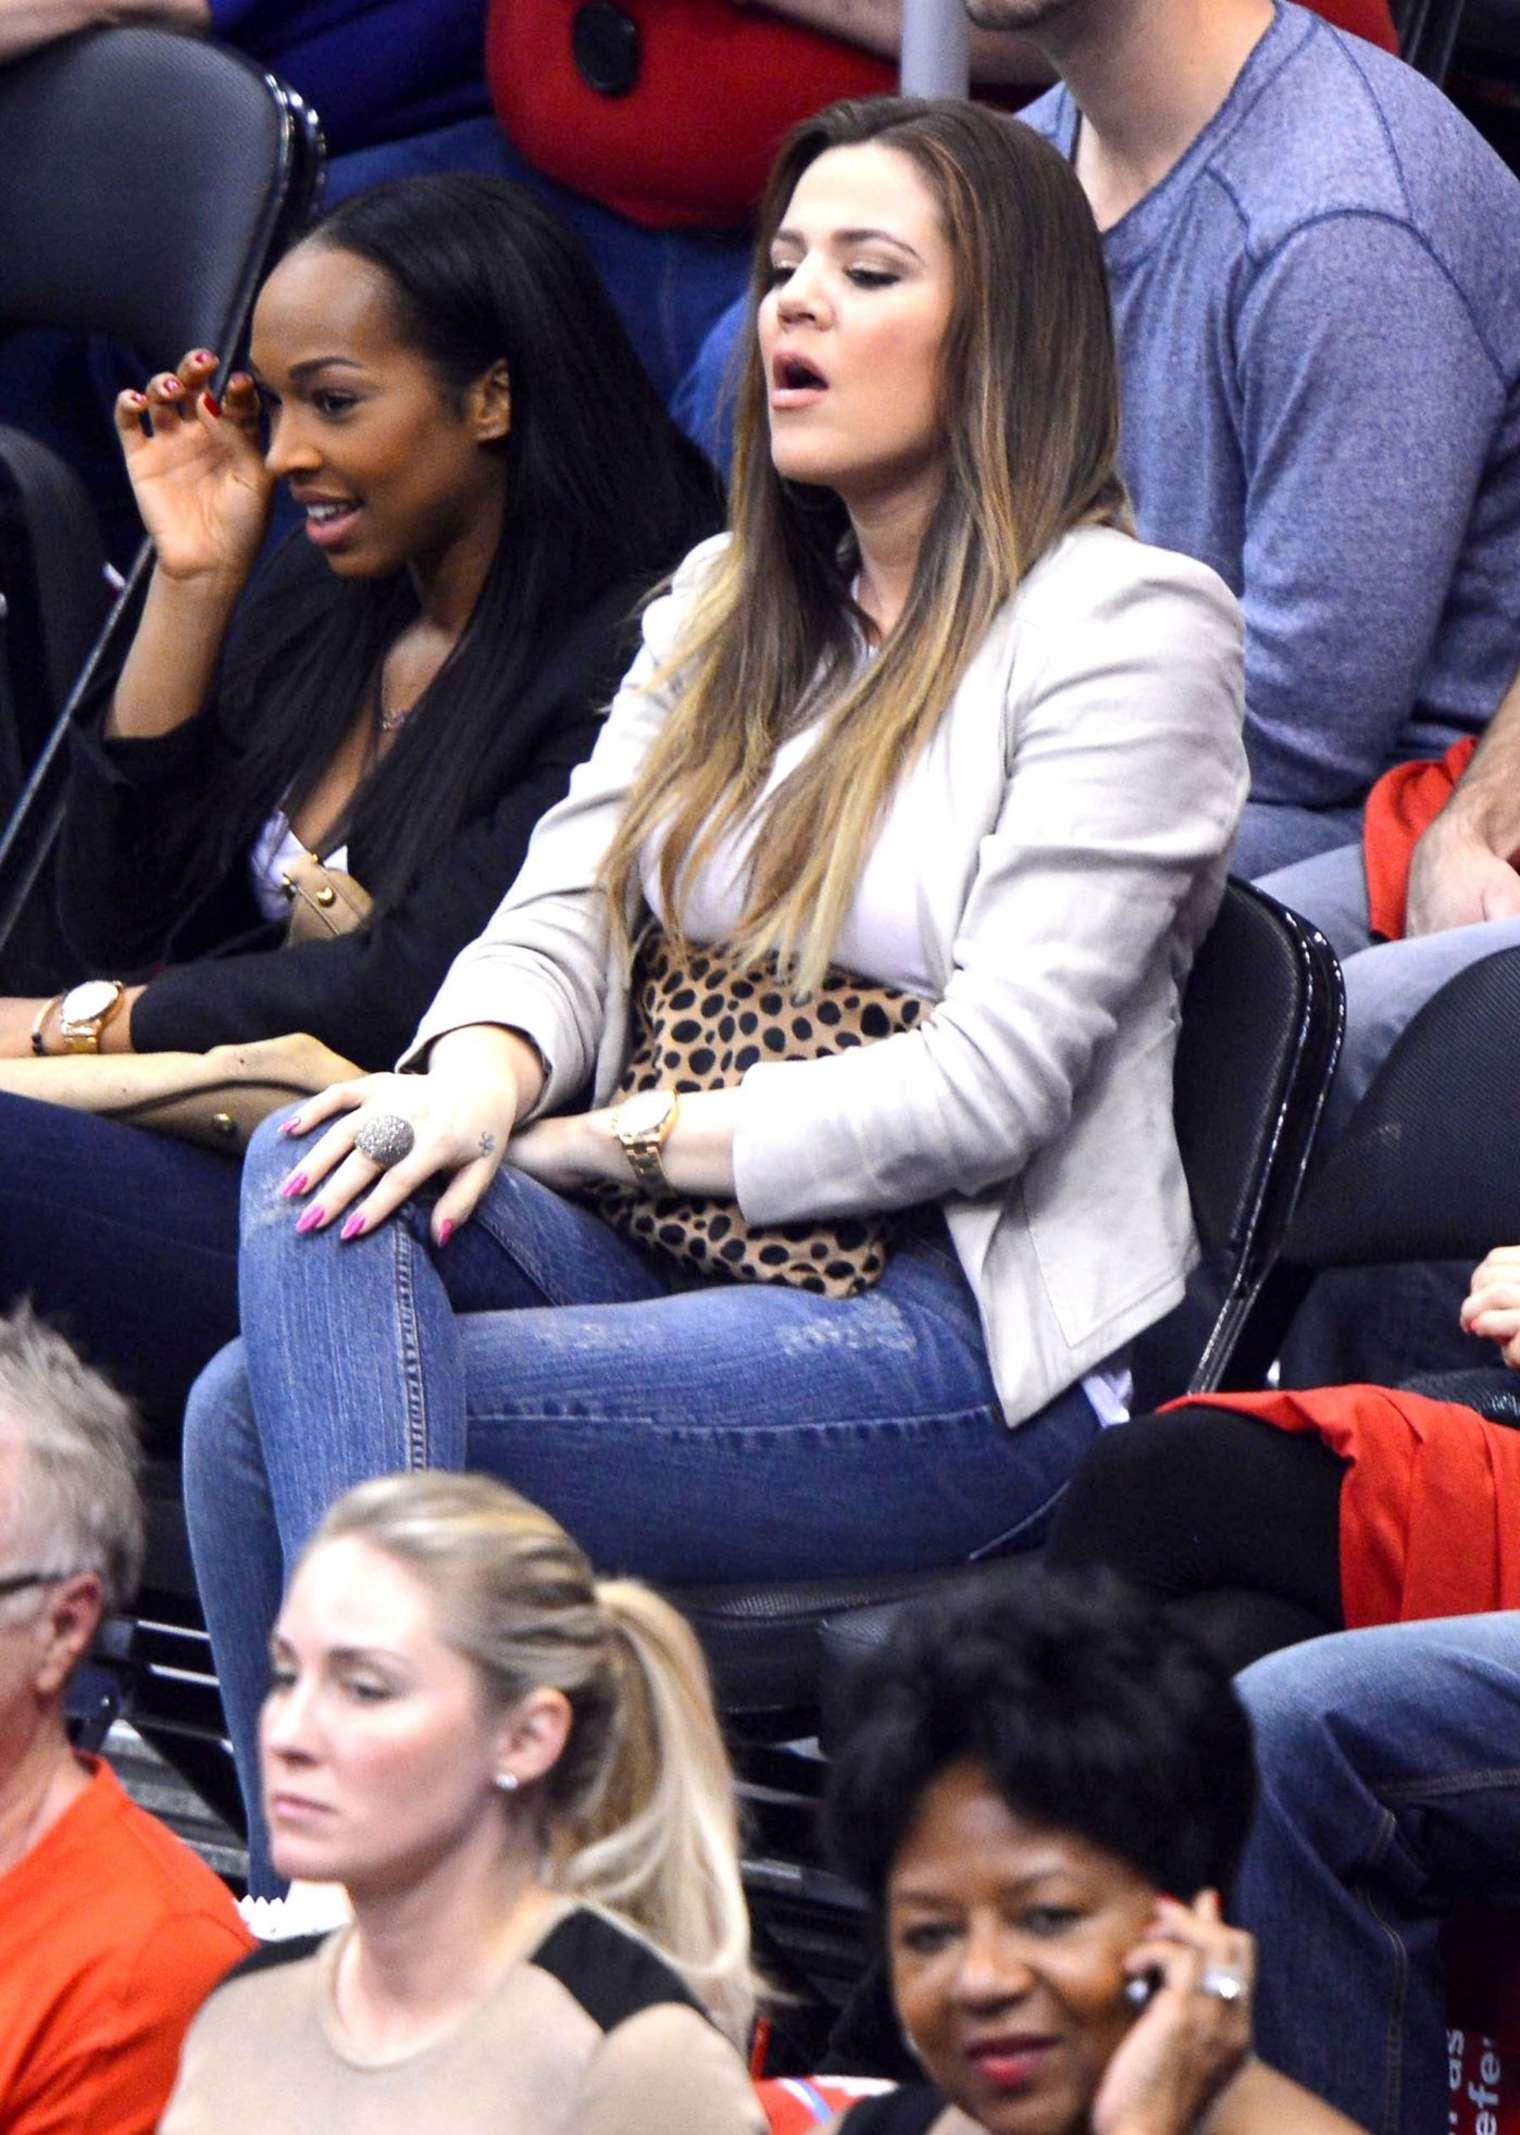 Khloe Kardashian 2013 : Khloe Kardashian at the LA Clippers game -10